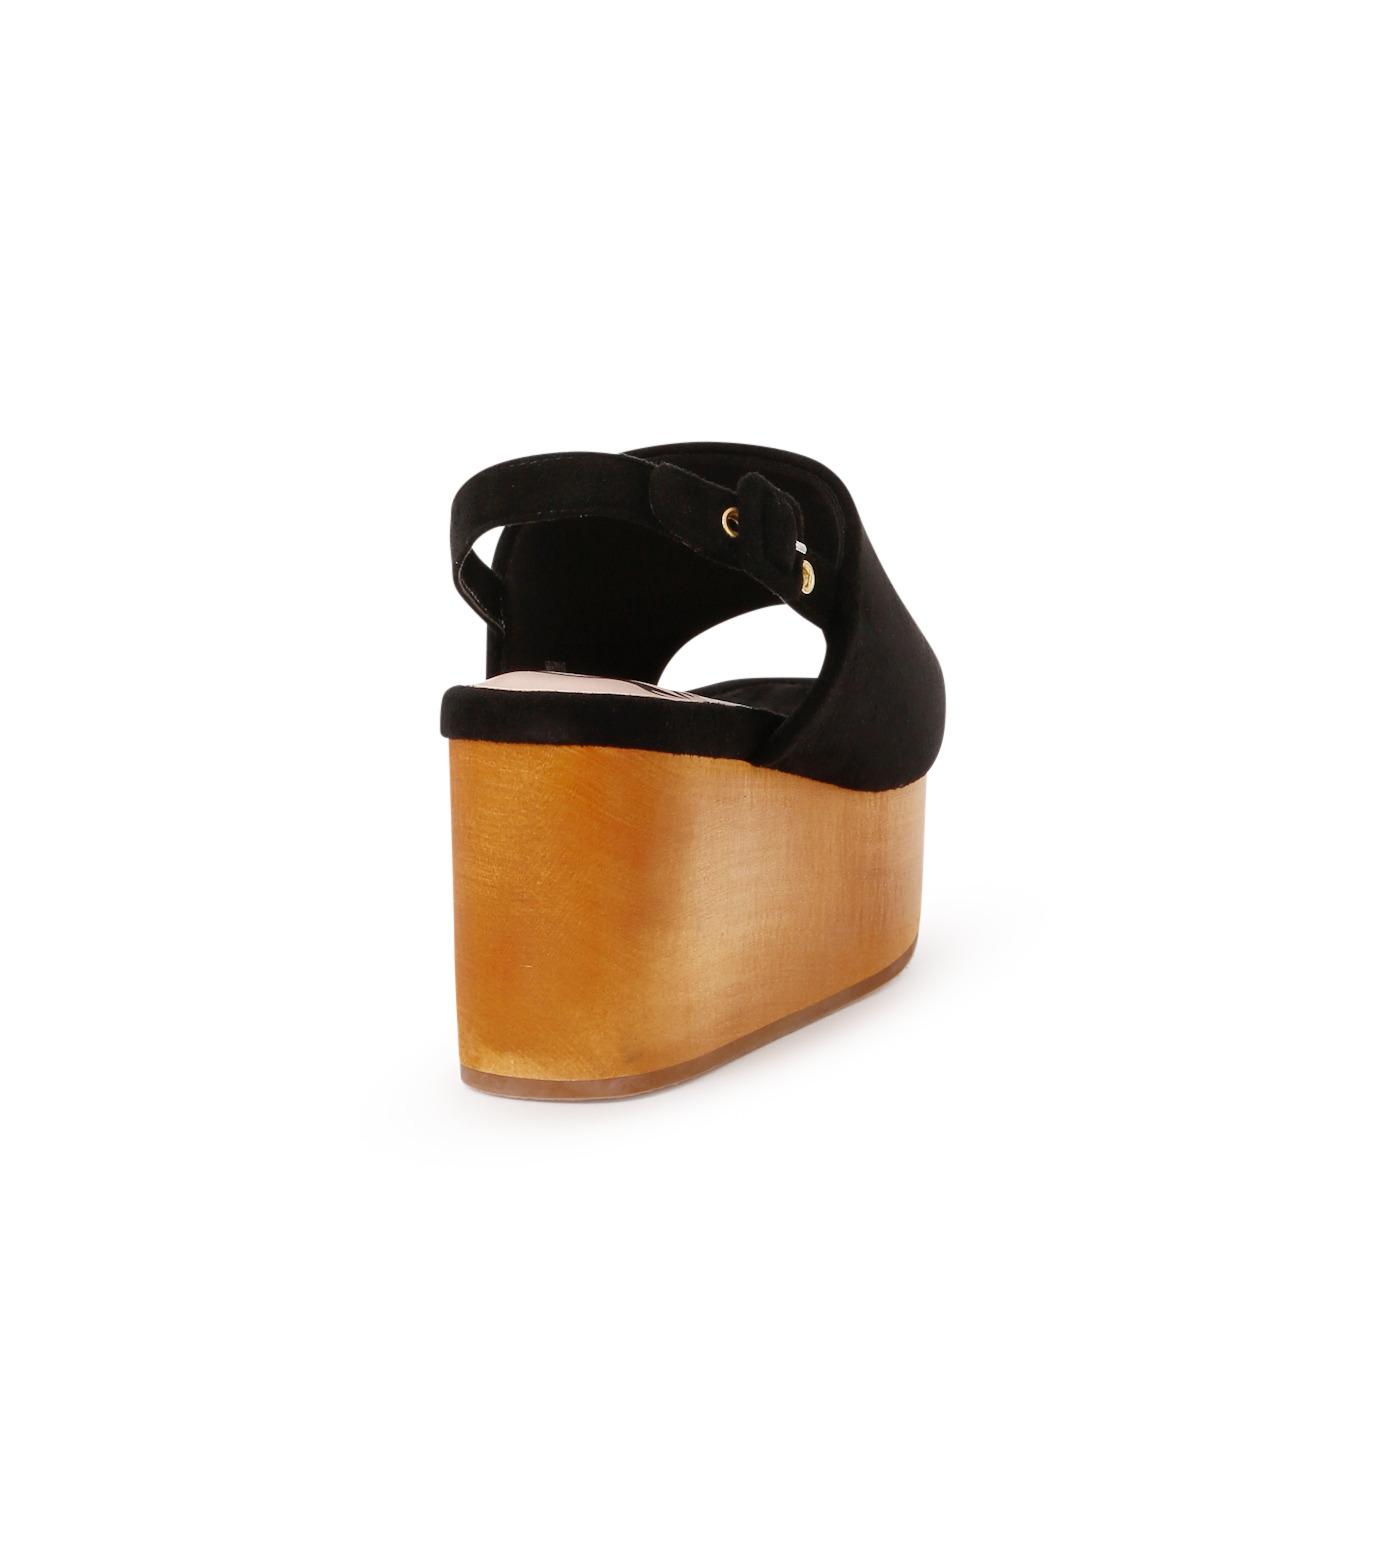 Myneself(マインセルフ)のFake Suede Sandal-BLACK(フラットシューズ/Flat shoes)-MSS7-0010-13 拡大詳細画像3